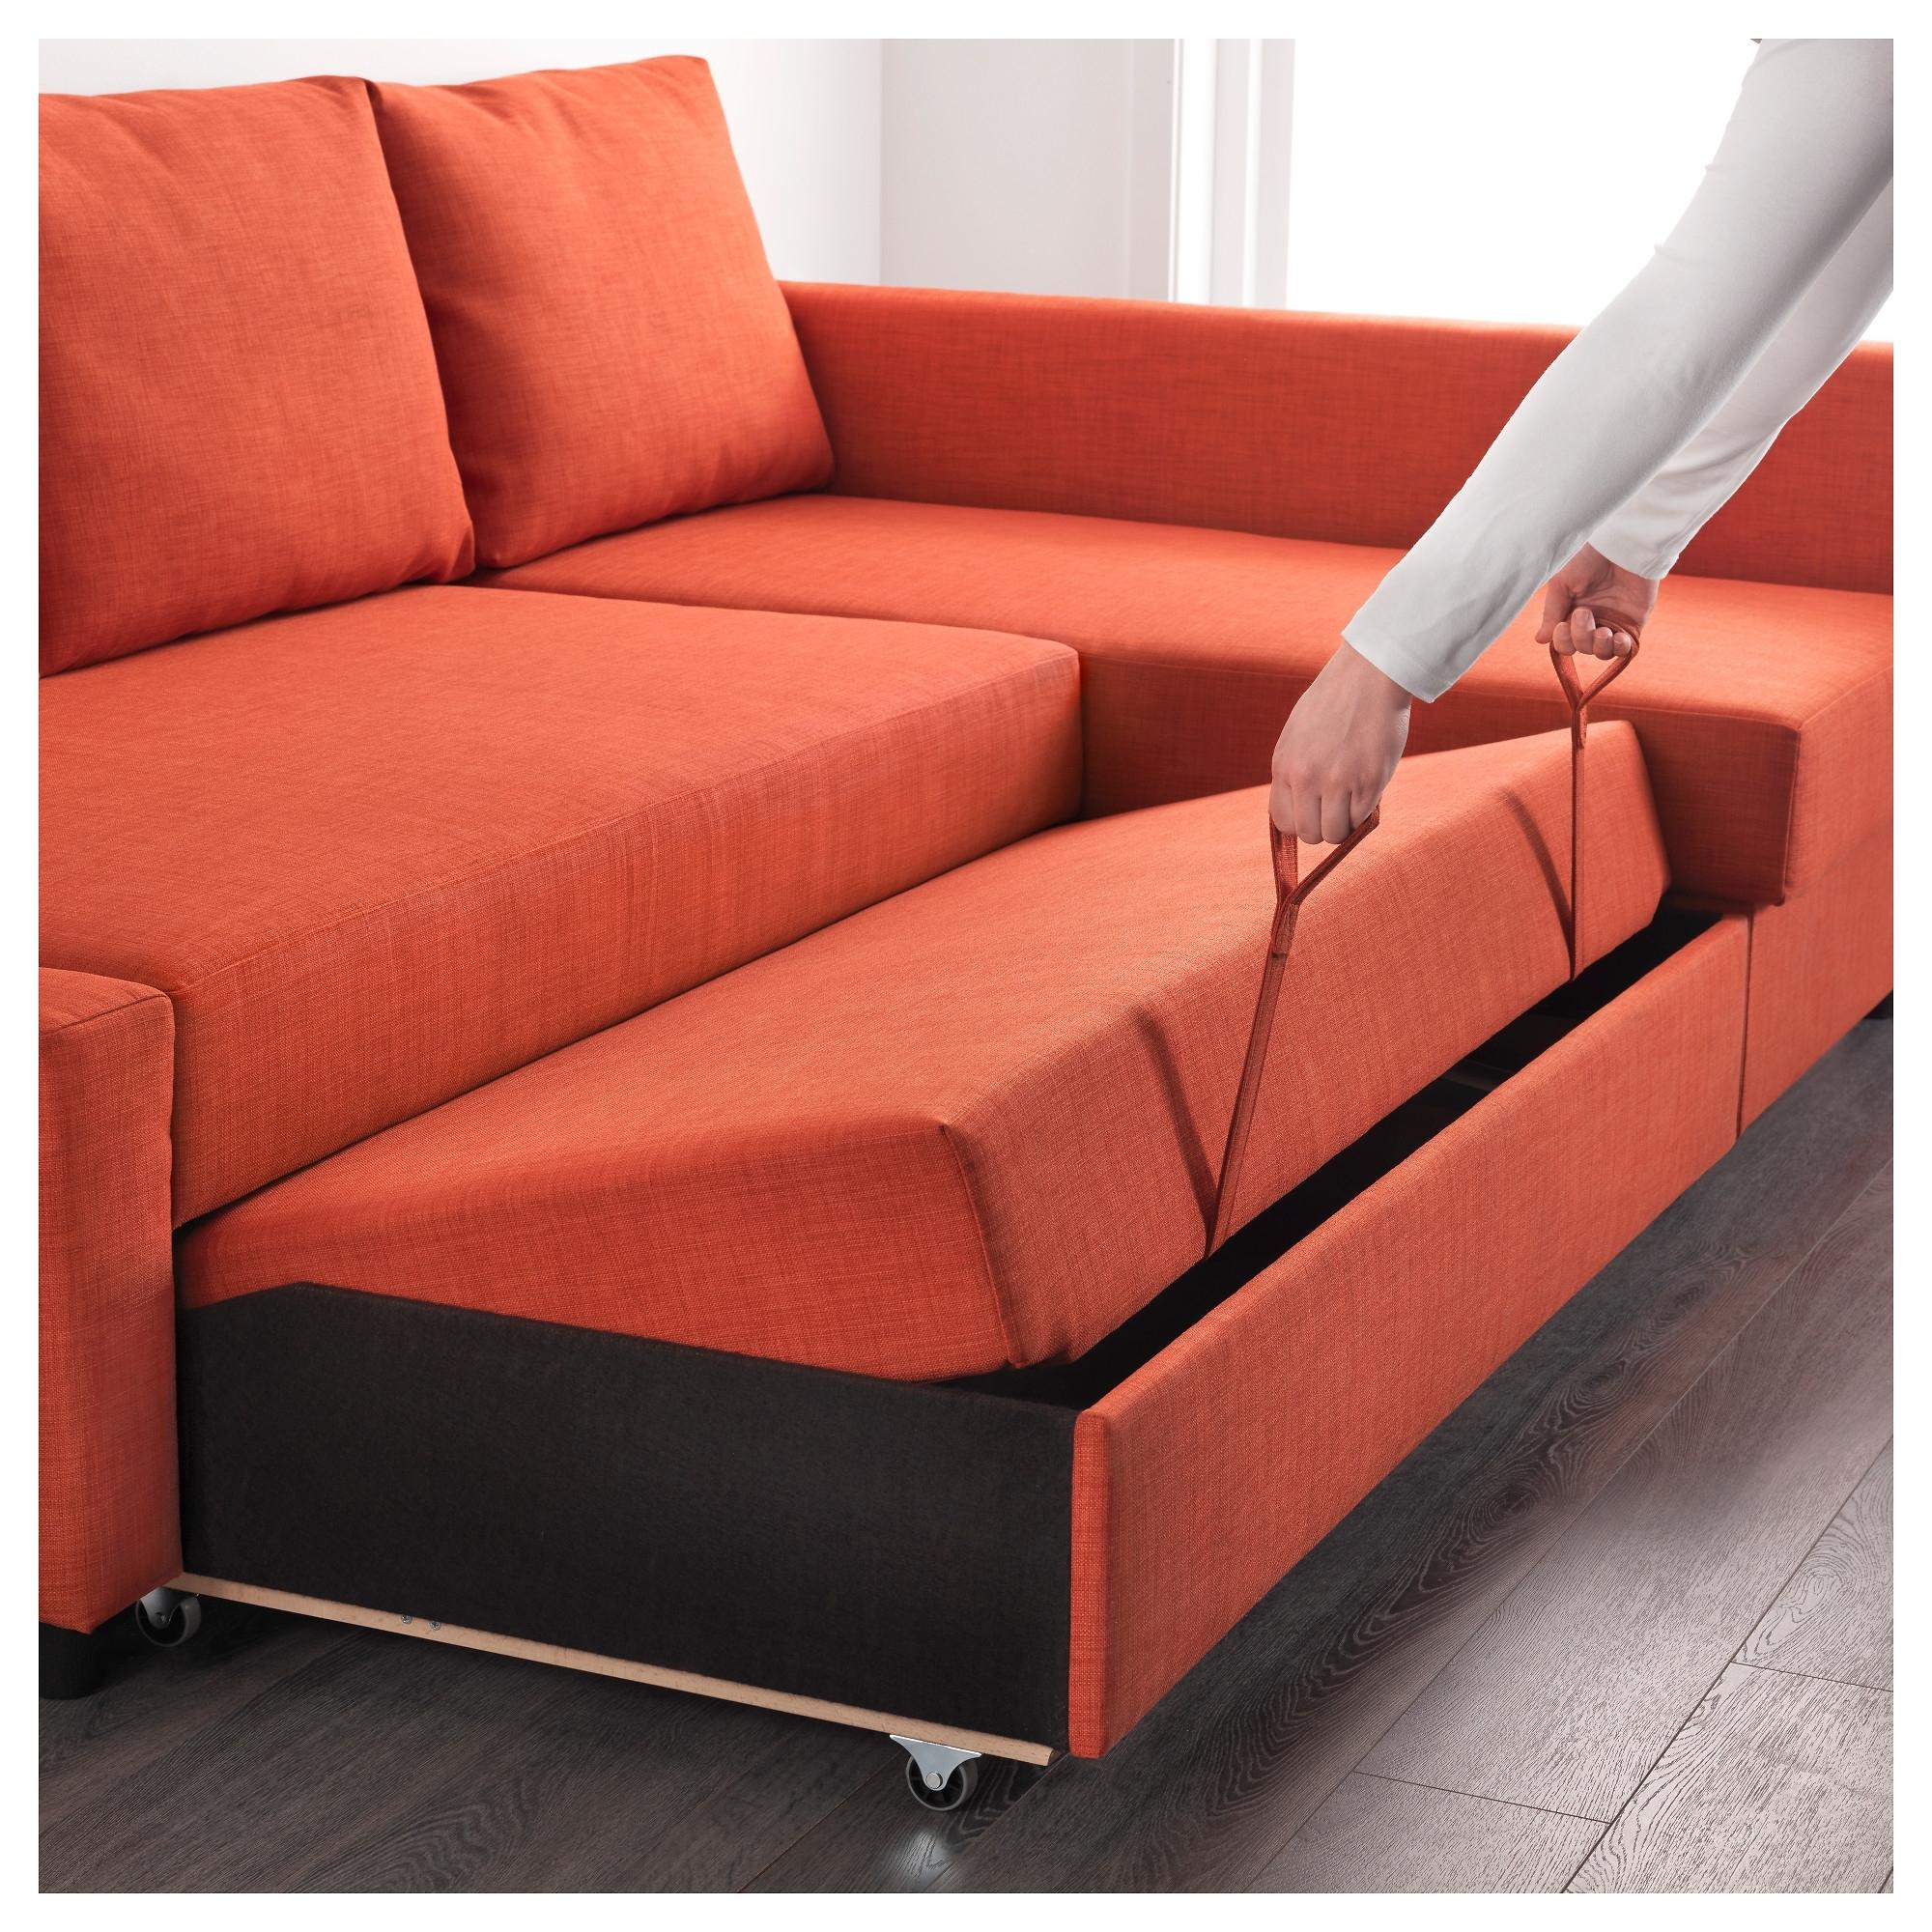 Ikea Corner Sofas With Storage With Regard To Well Liked Friheten Corner Sofa Bed With Storage Skiftebo Dark Orange – Ikea (View 8 of 20)